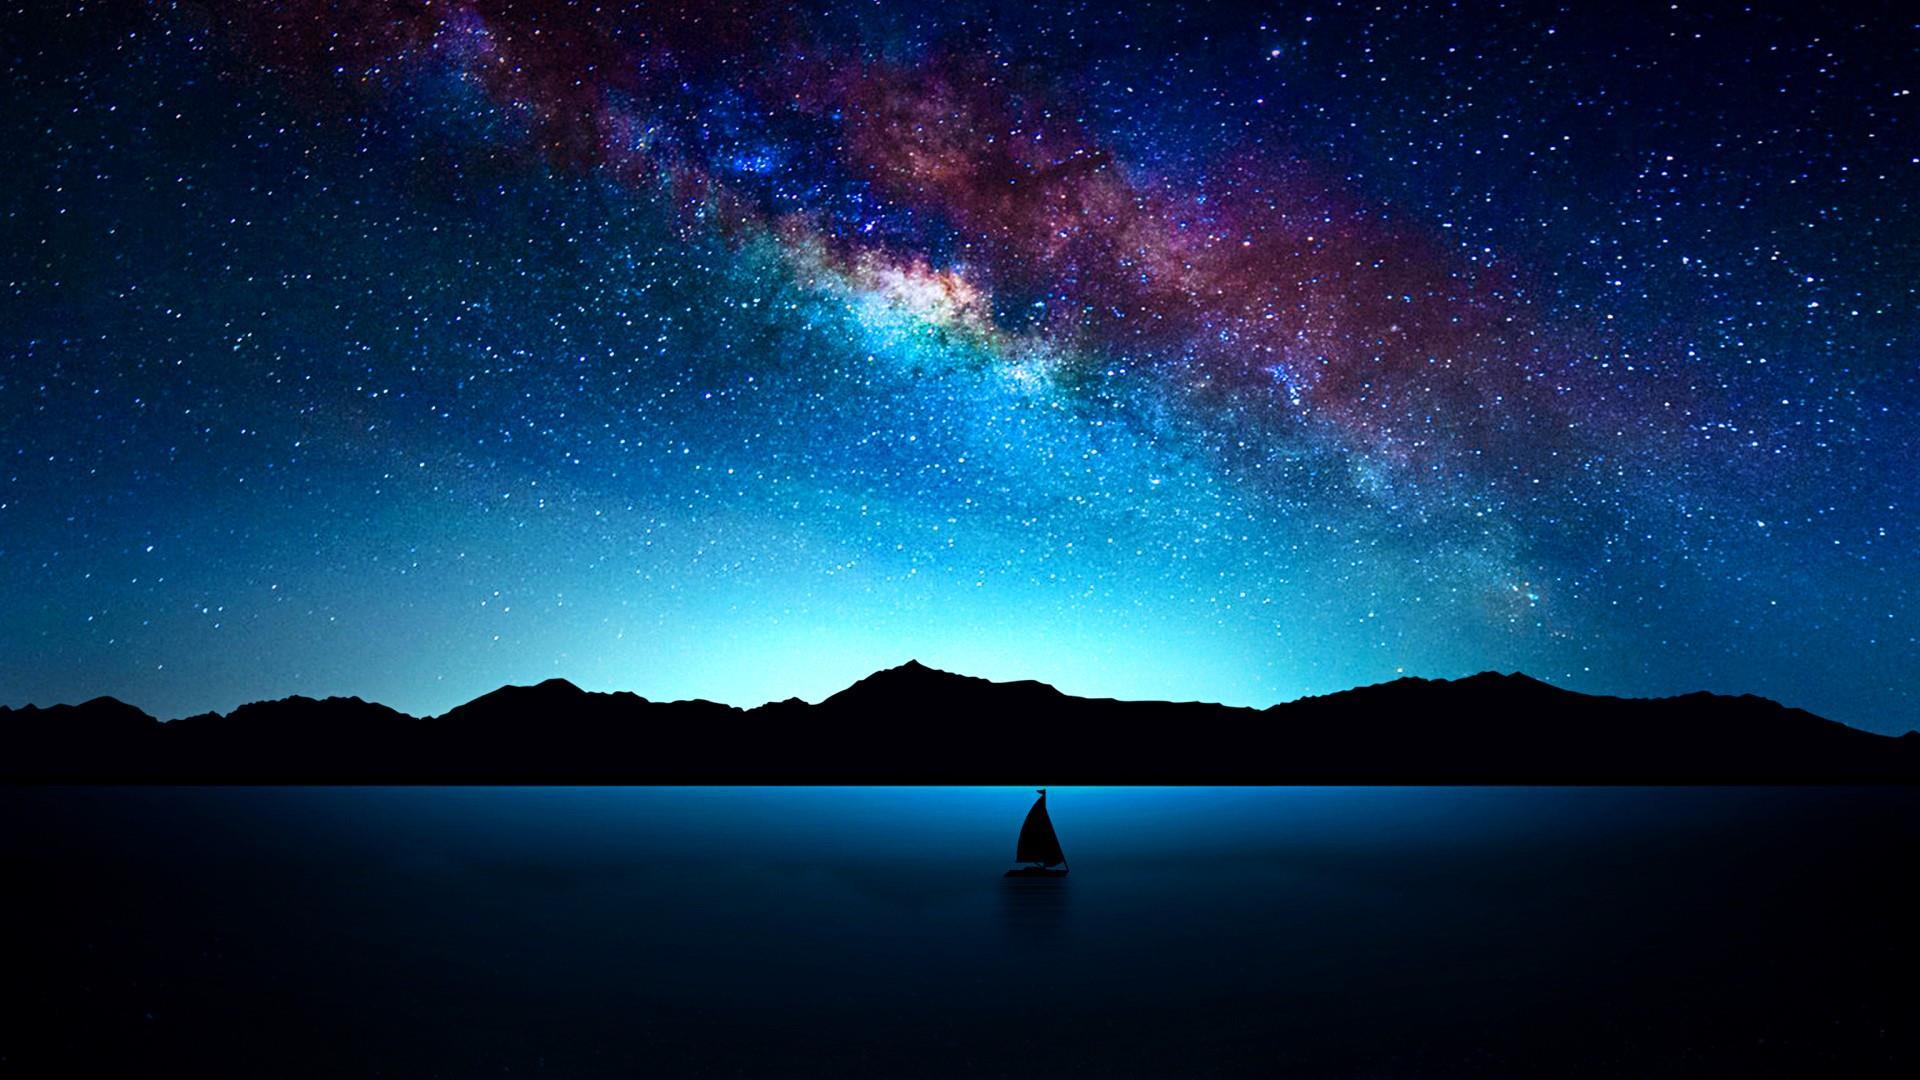 Landscape Portrait Milky Way 587748 Hd Wallpaper Backgrounds Download